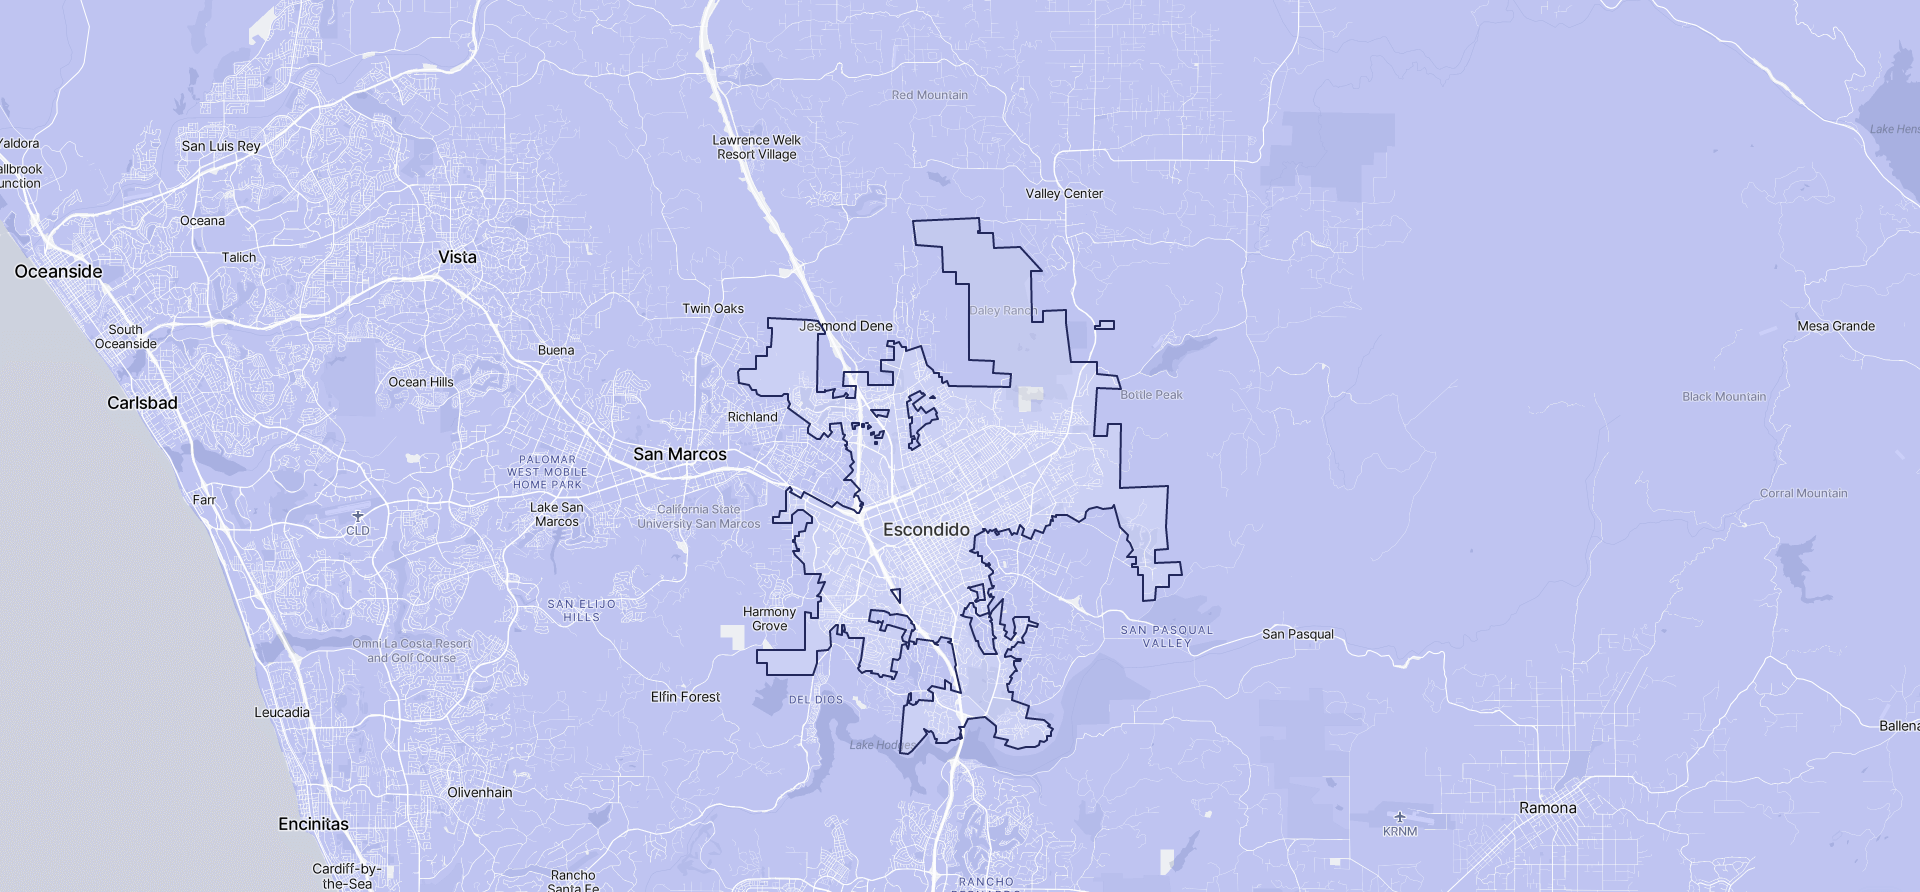 Image of Escondido boundaries on a map.